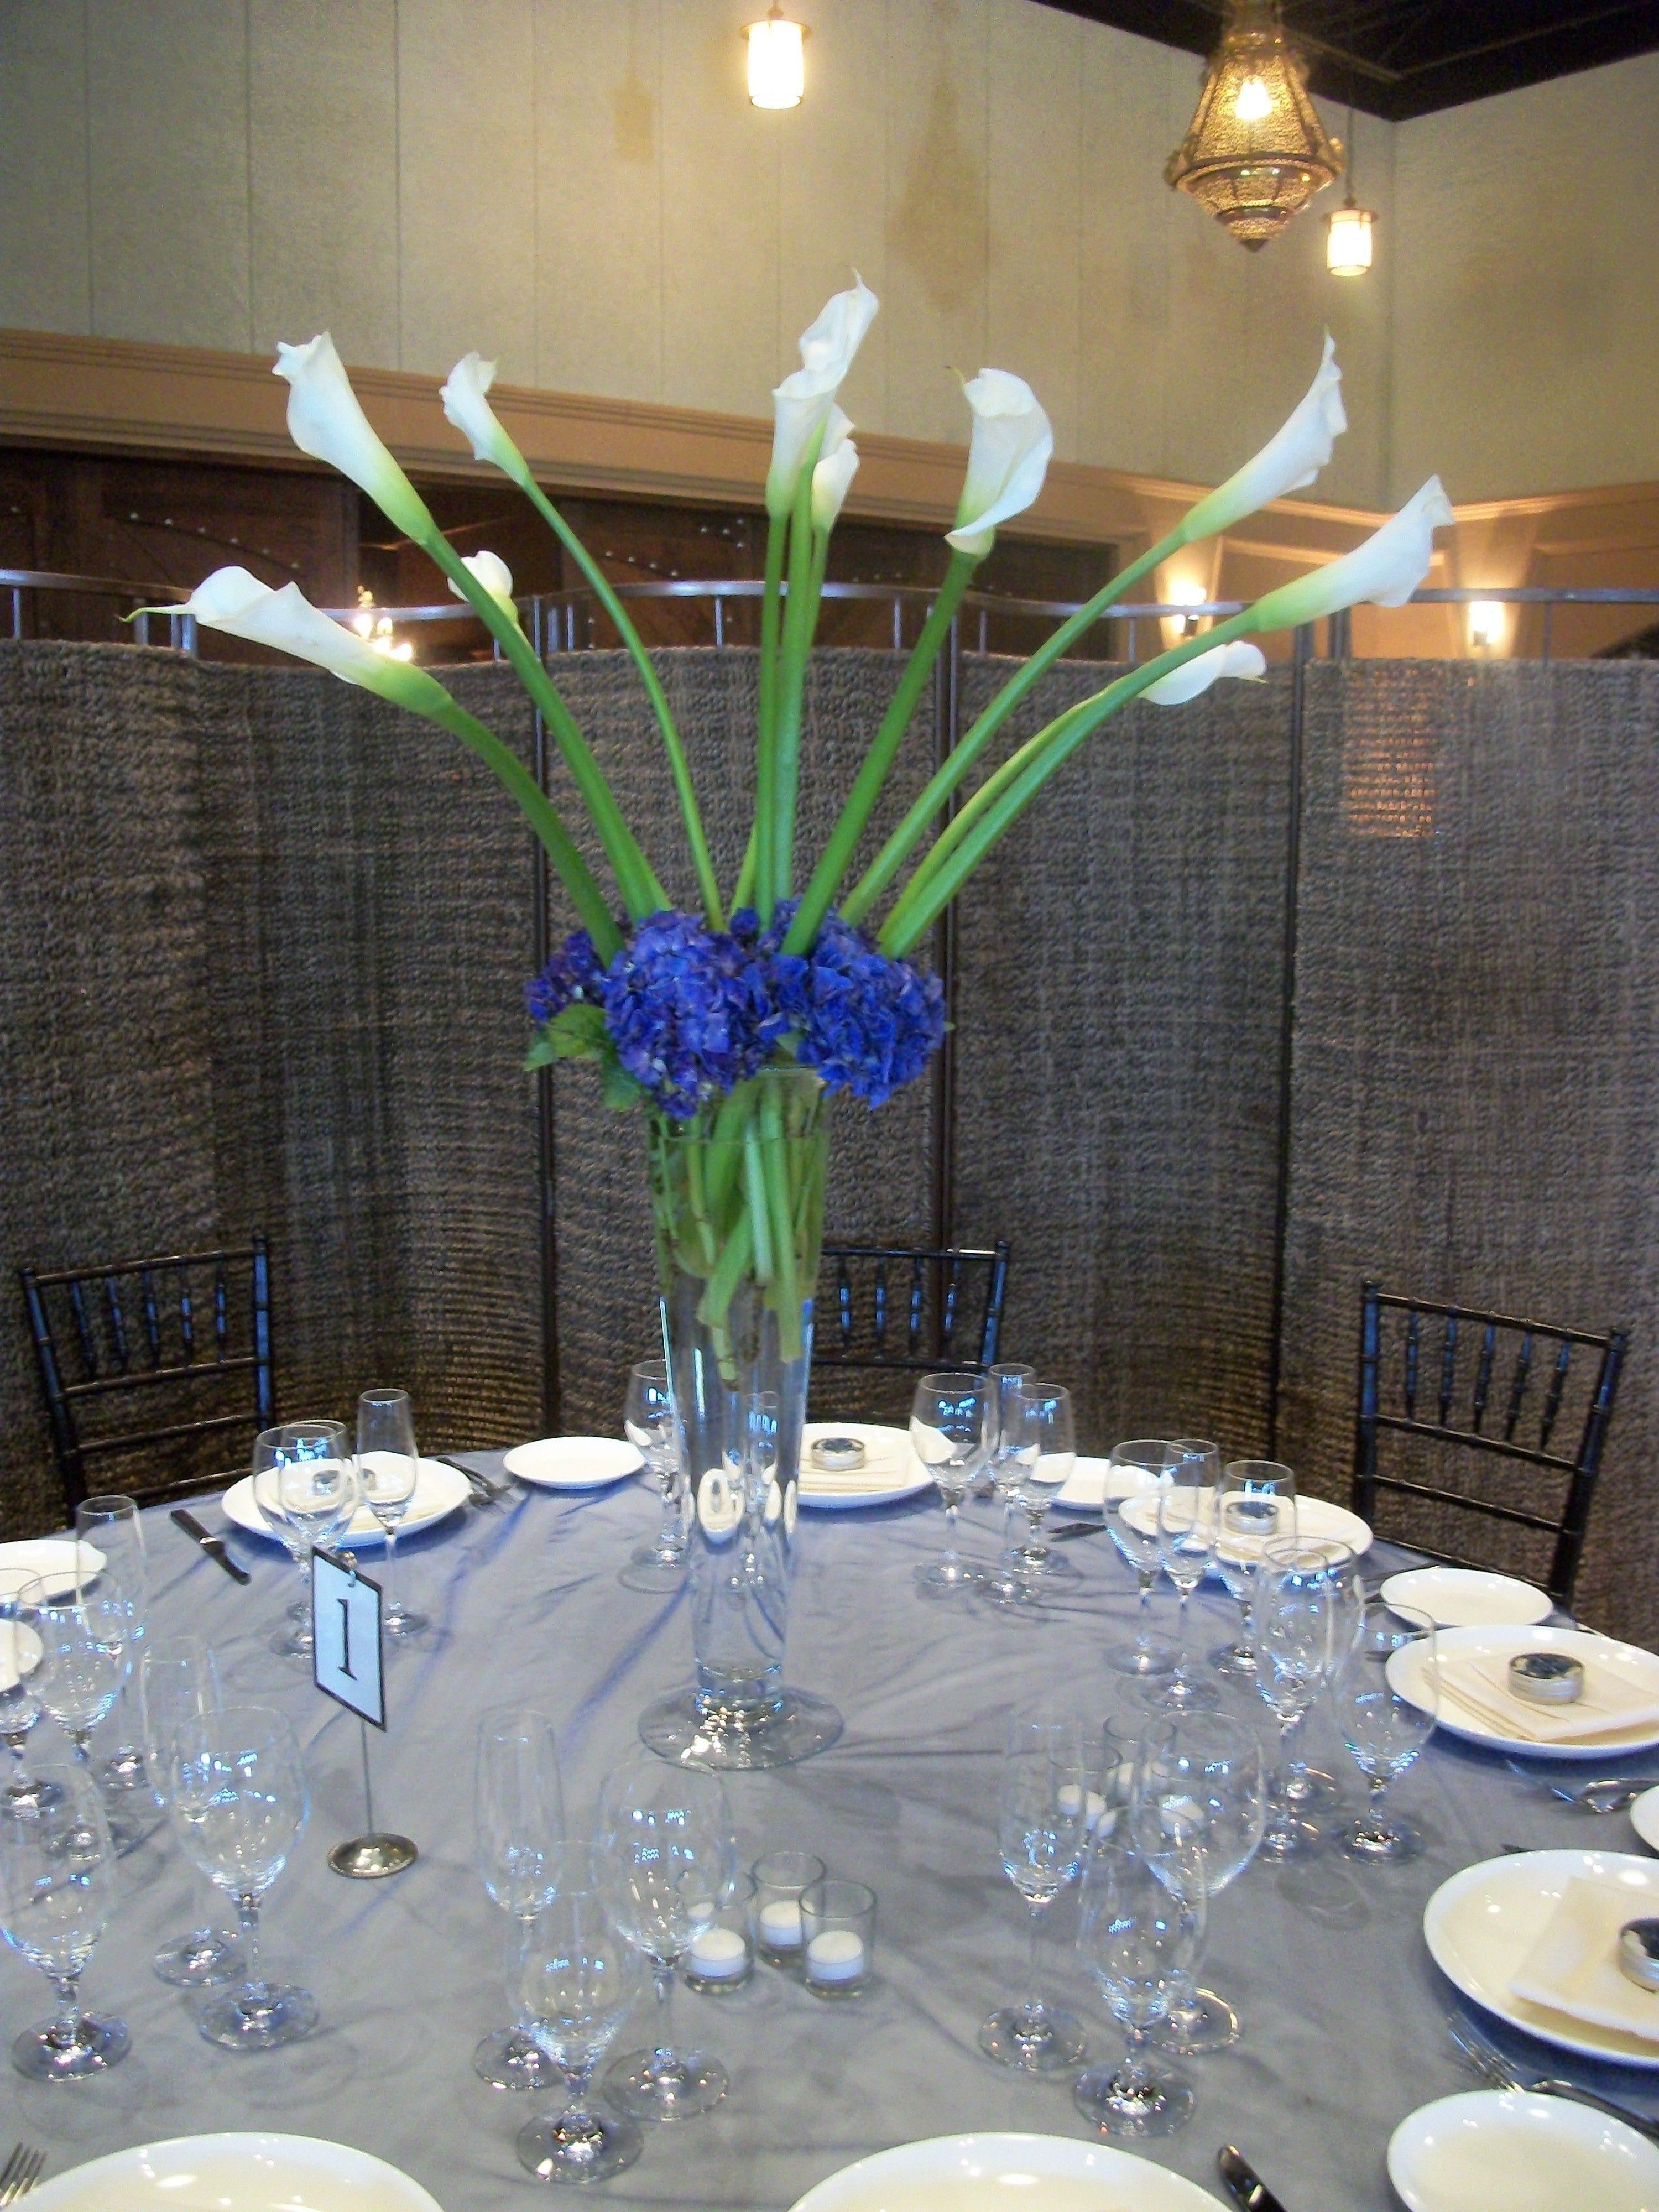 ceramic cube vase of awesome blue hydrangea in vase bogekompresorturkiye com regarding blue hydrangea in vase newest dark blue hydrangea tall white calla lilies in trumpet vase design